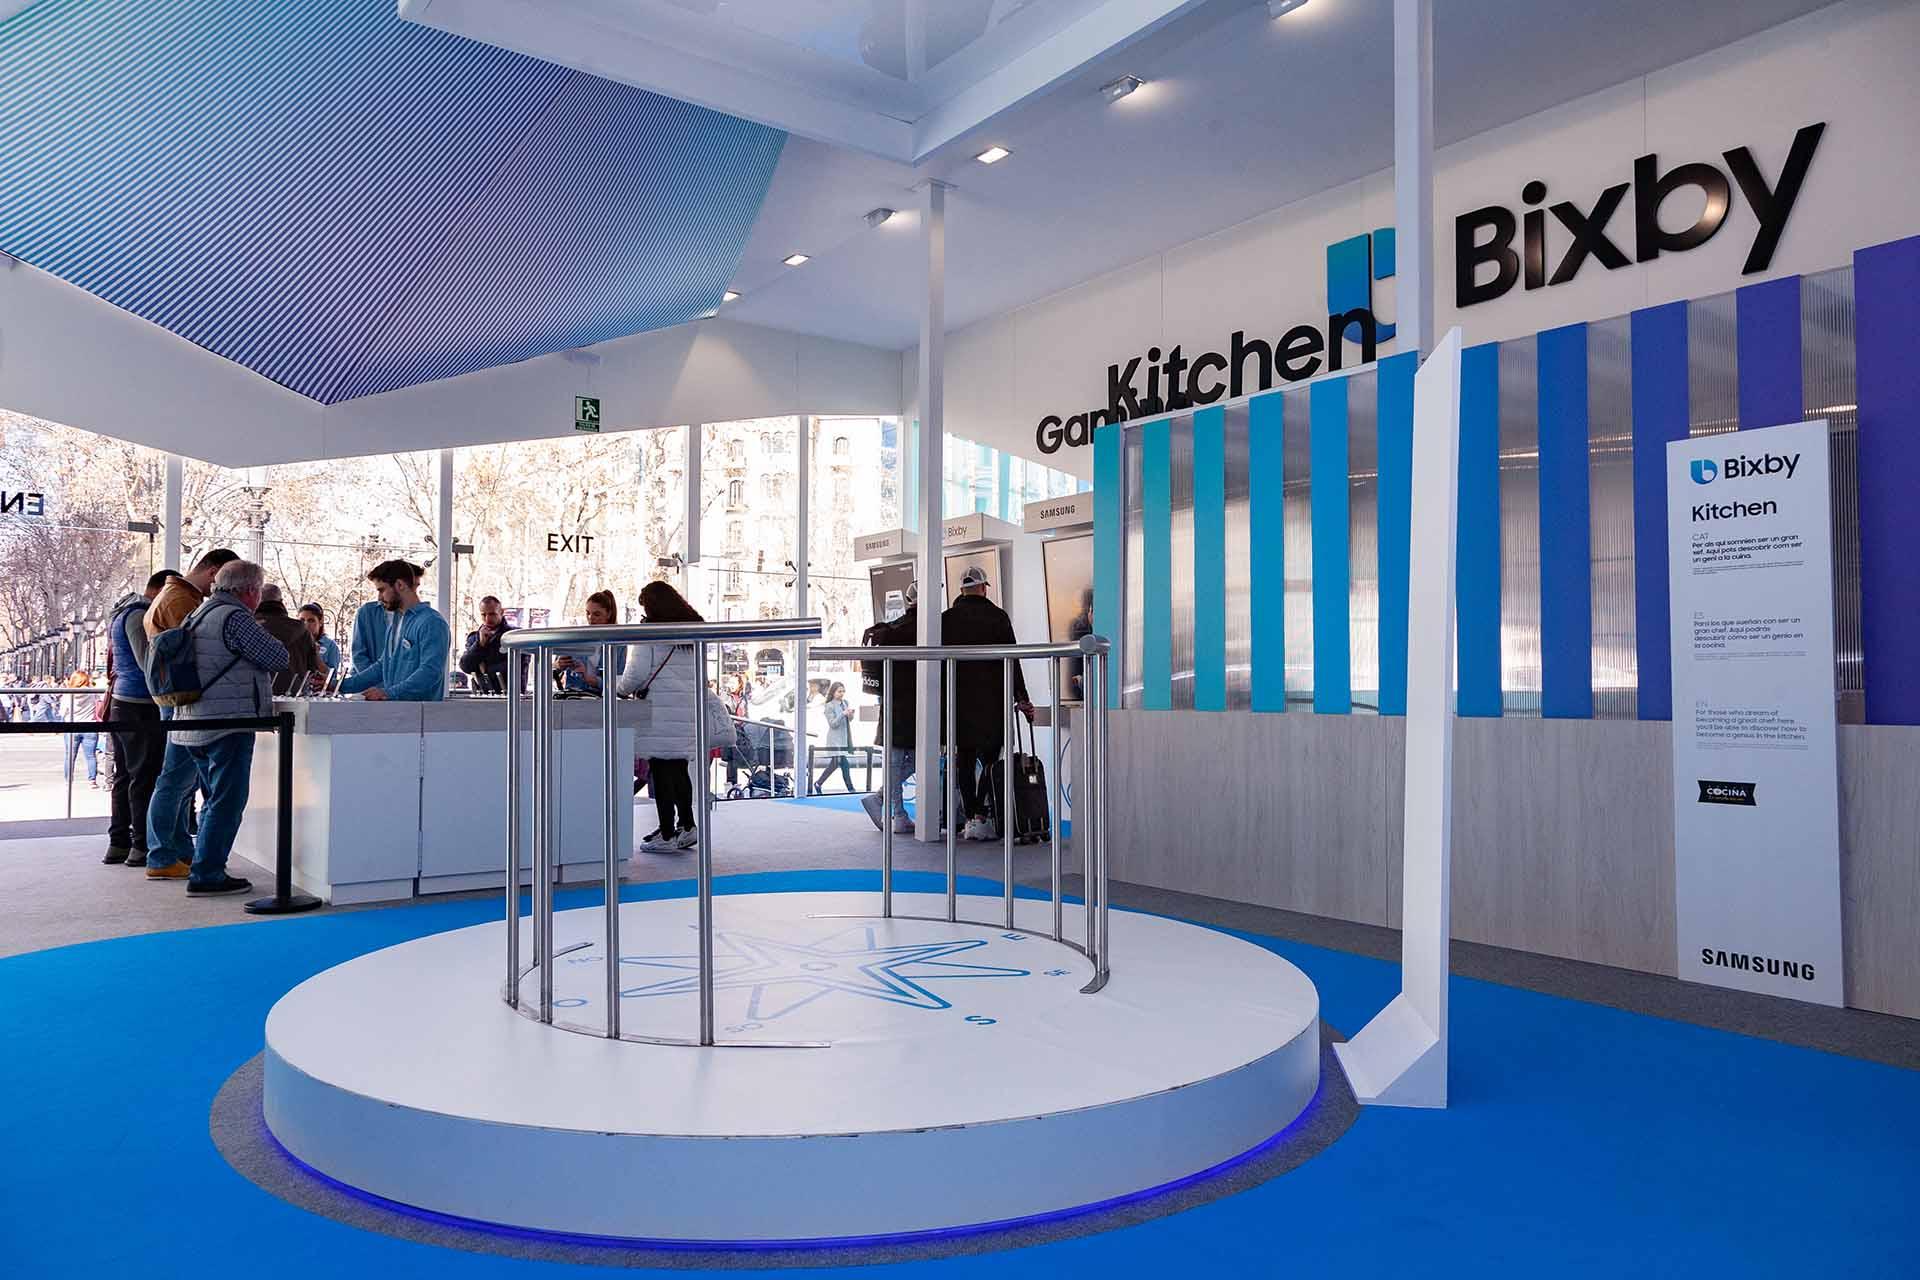 Samsung Bixby pop up. Interior design